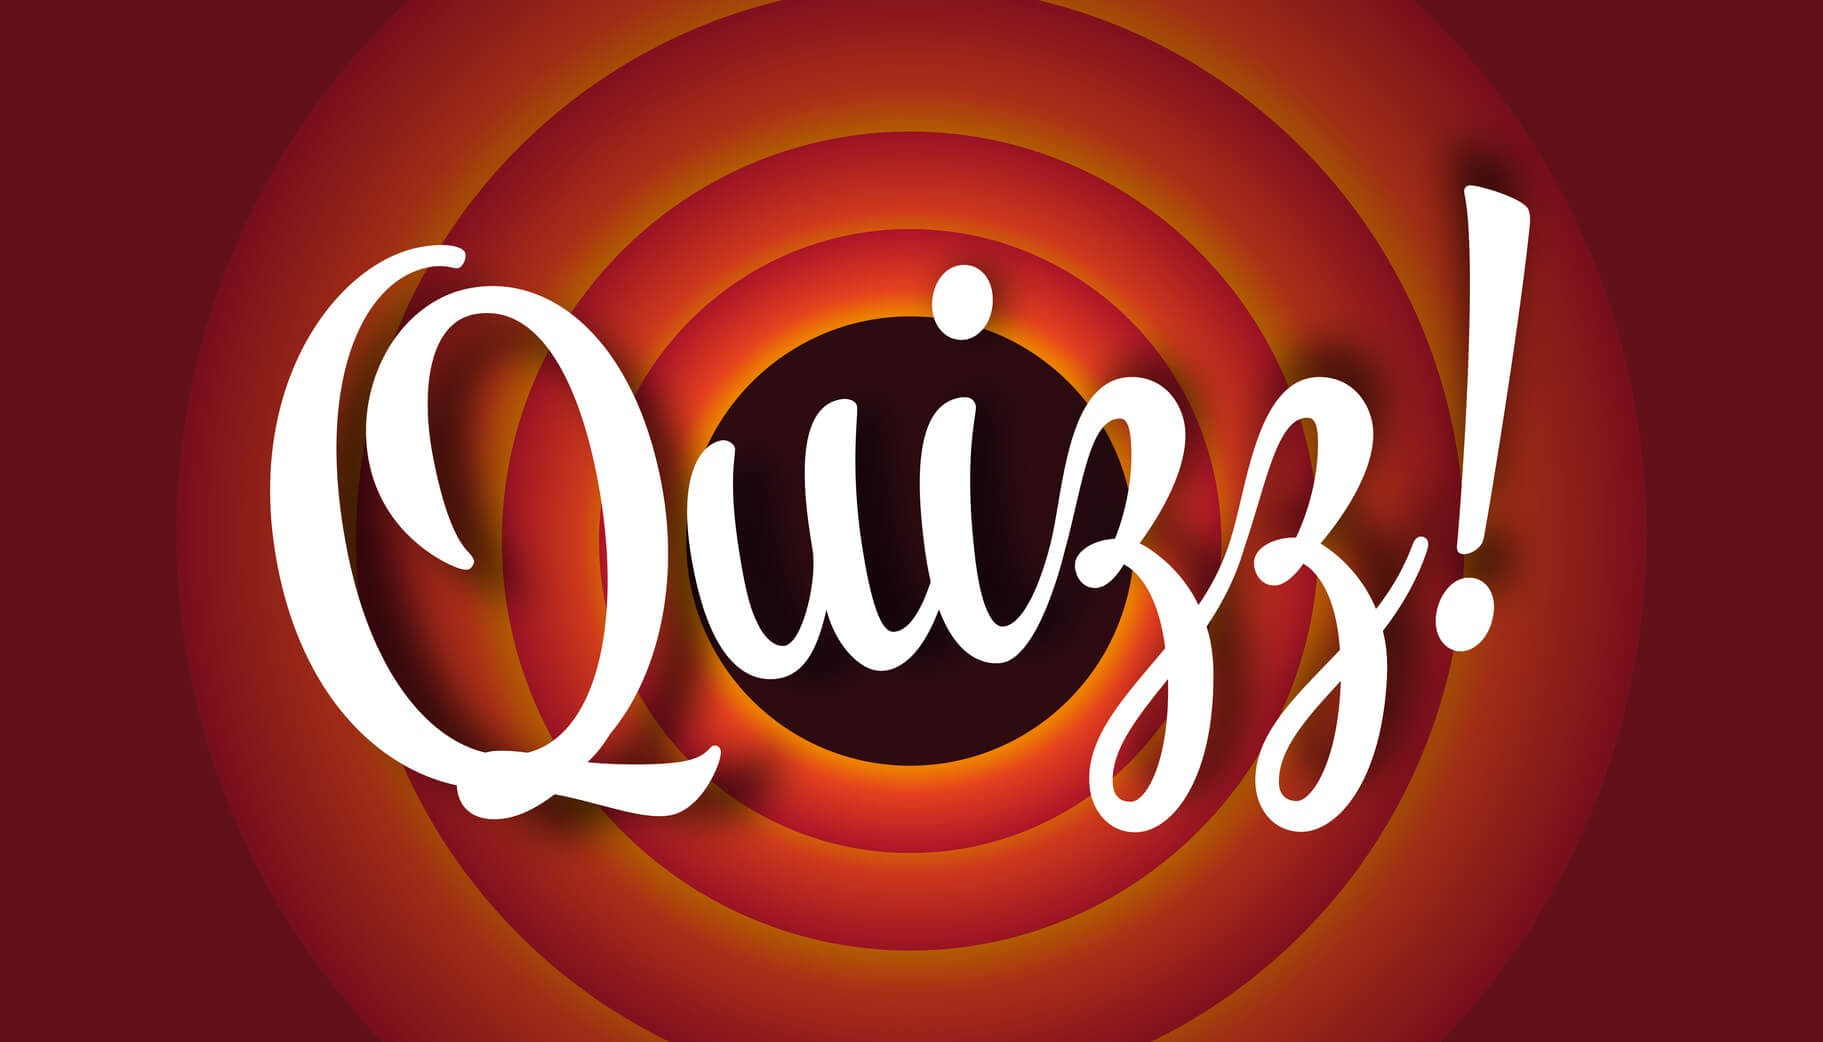 Quizz.biz (n°1)